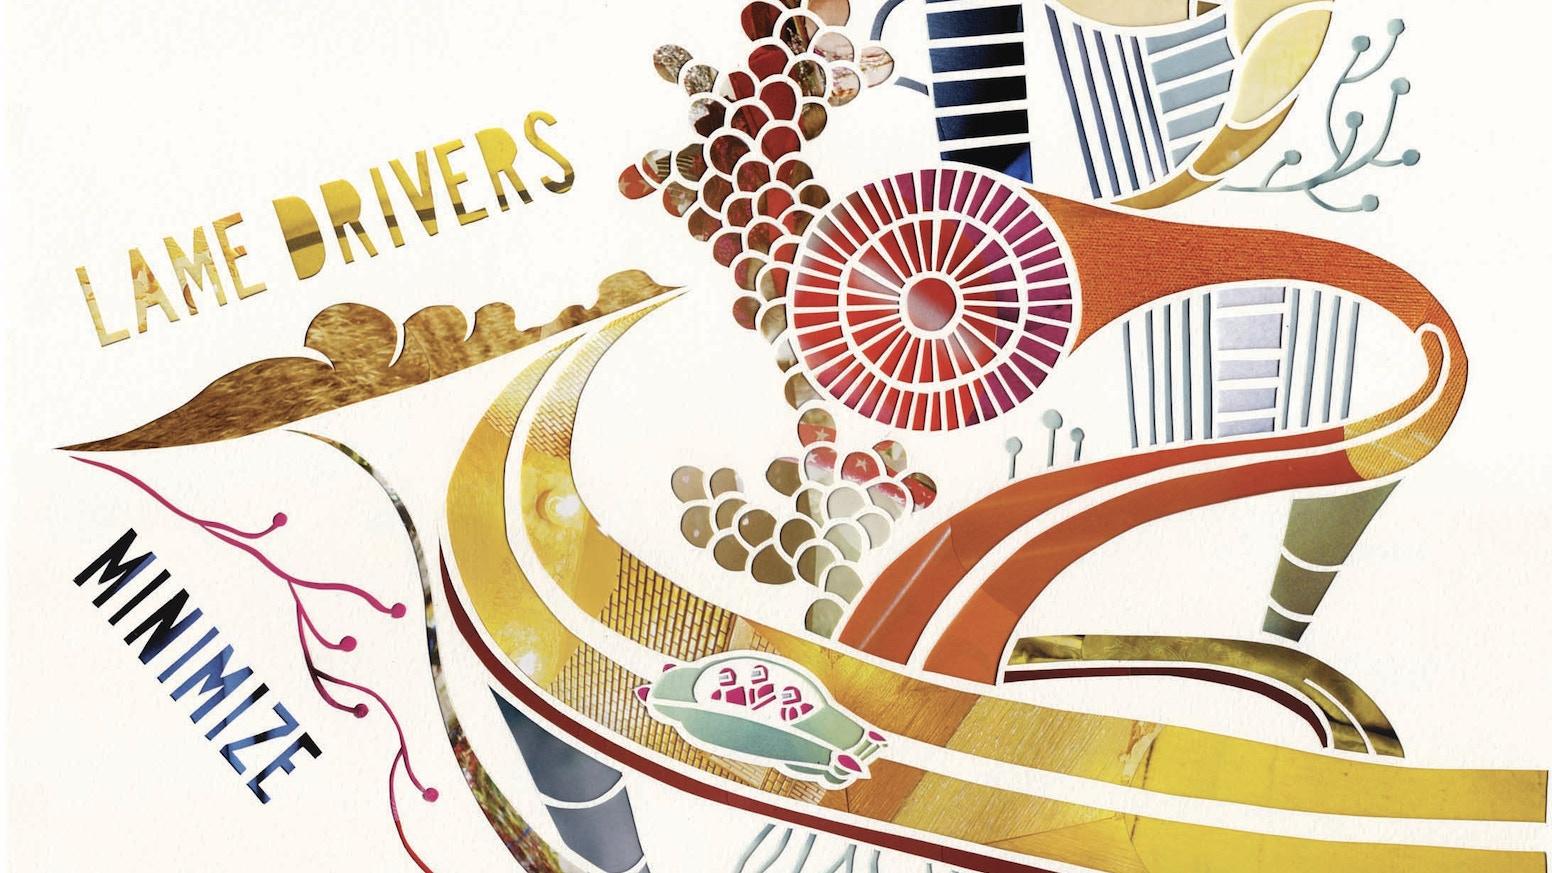 lame drivers flexi-disc ep + 12